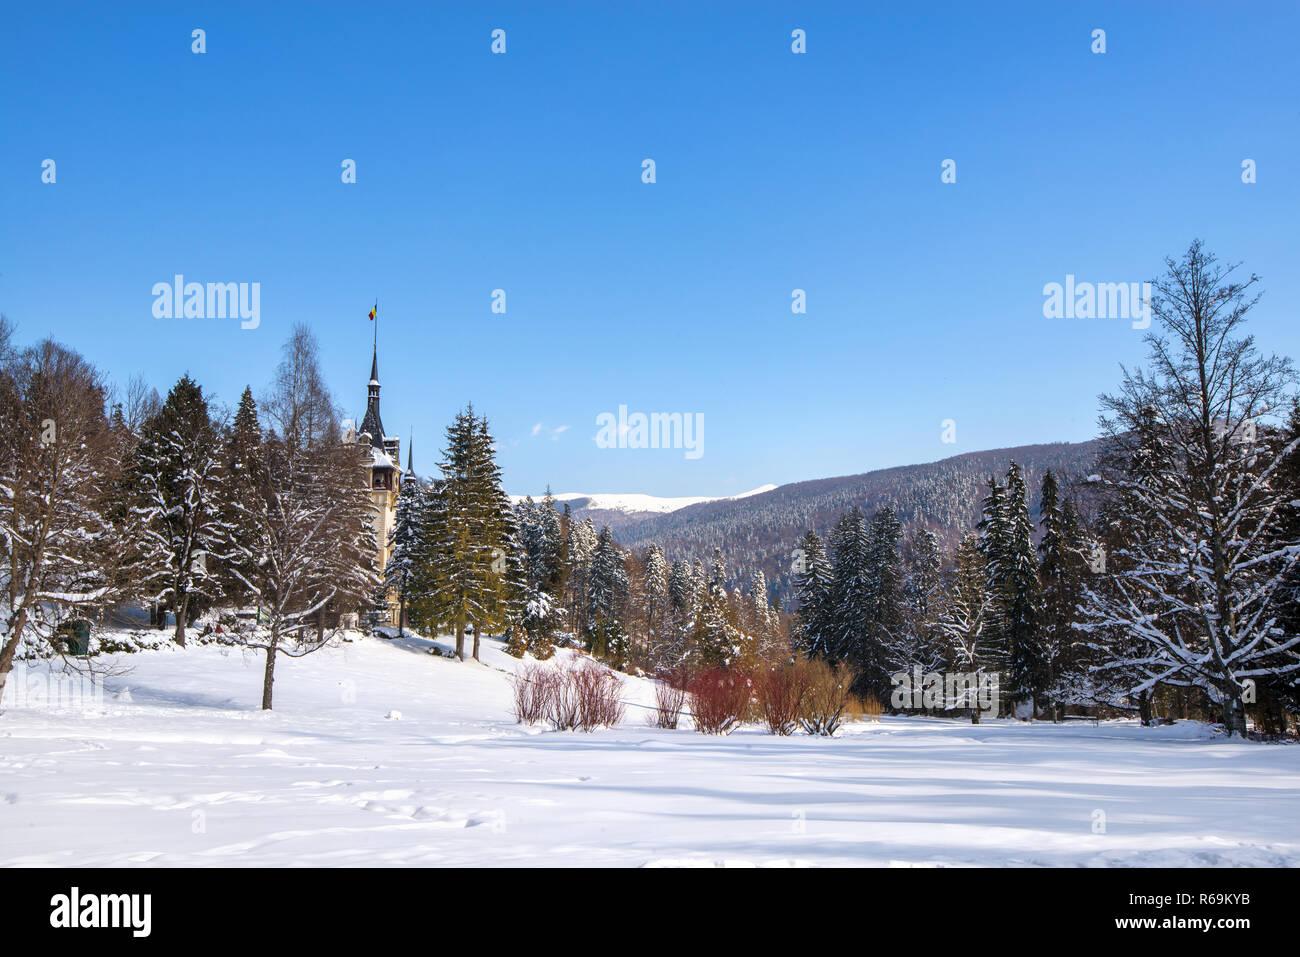 Peles castle in Romania. Beautiful, royal castle in snowy, white winter. - Stock Image